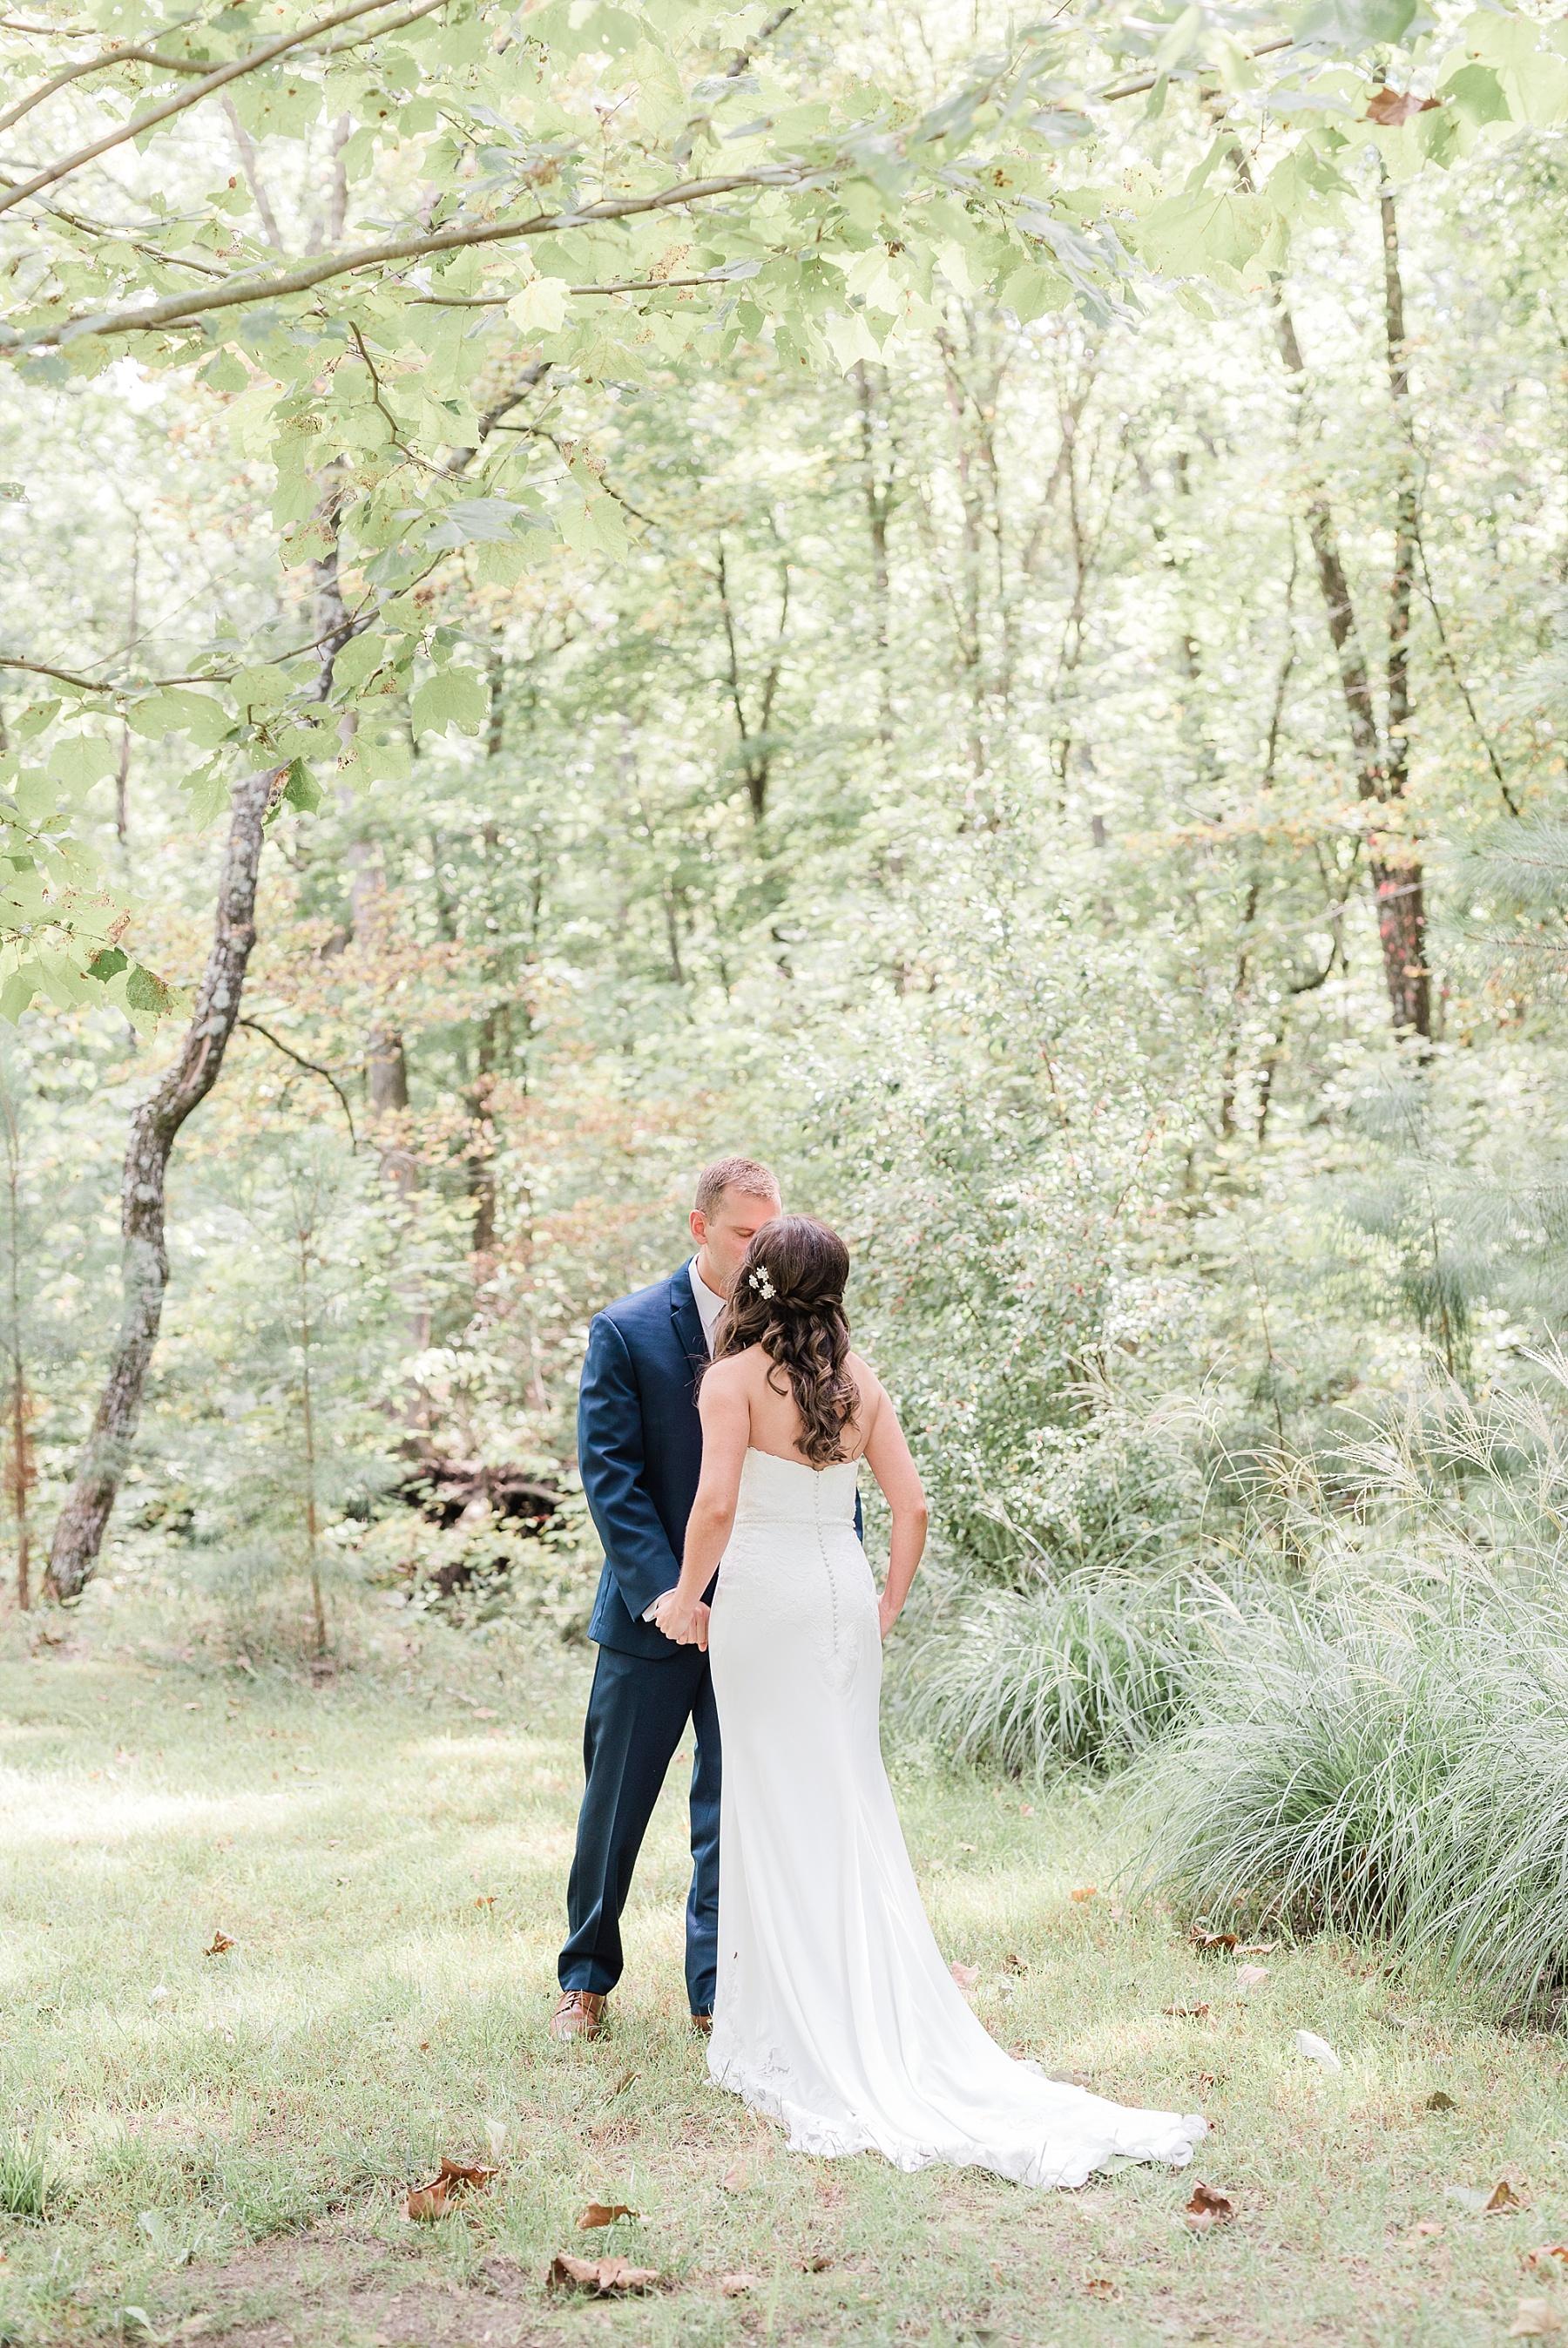 Romantic Summer Sunset Wedding Ceremony at Little Piney Lodge St. Louis Missouri by Kelsi Kliethermes Photography Fine Art Photographer_0045.jpg